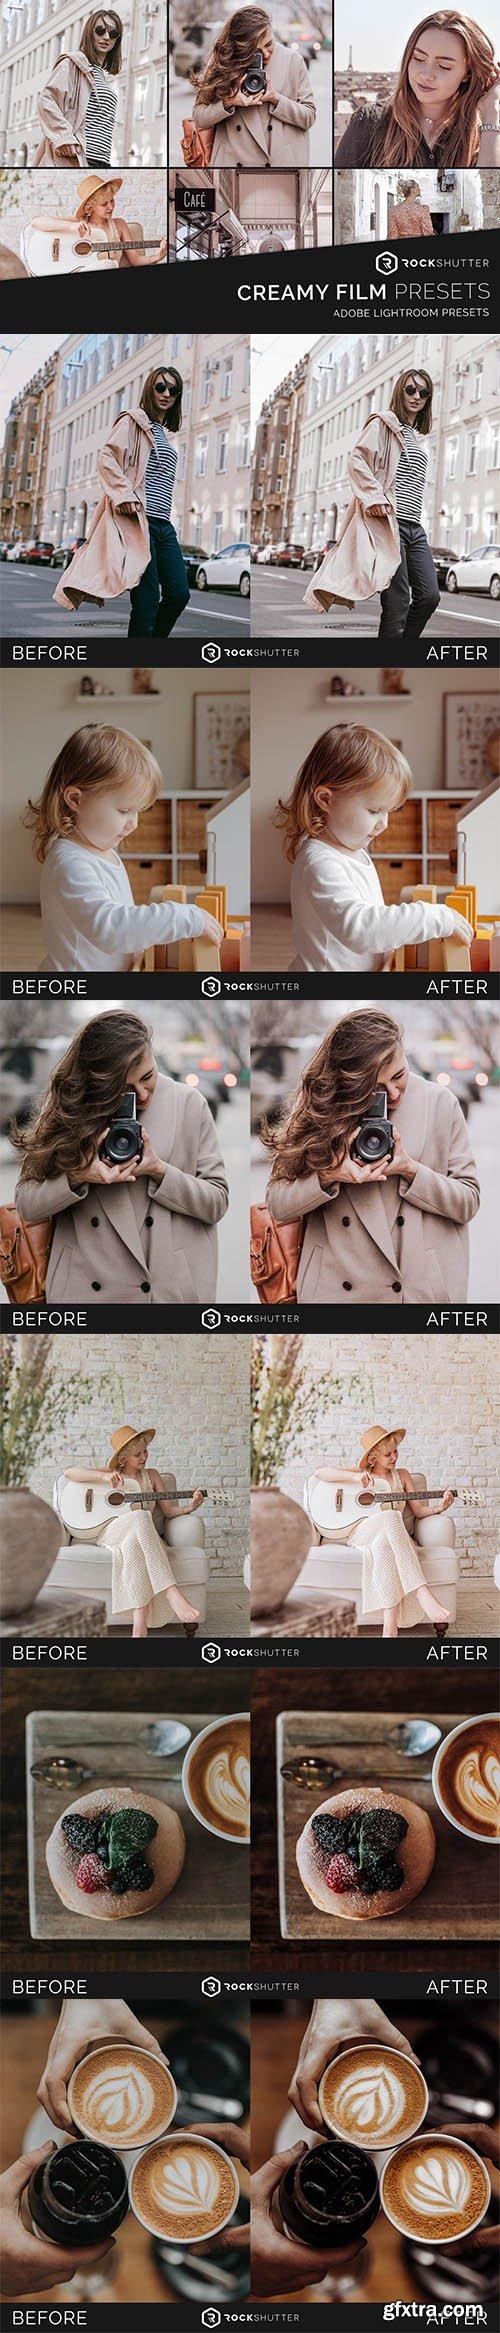 CreativeMarket - CREAMY FILM Mobile & Desktop Presets 5938710